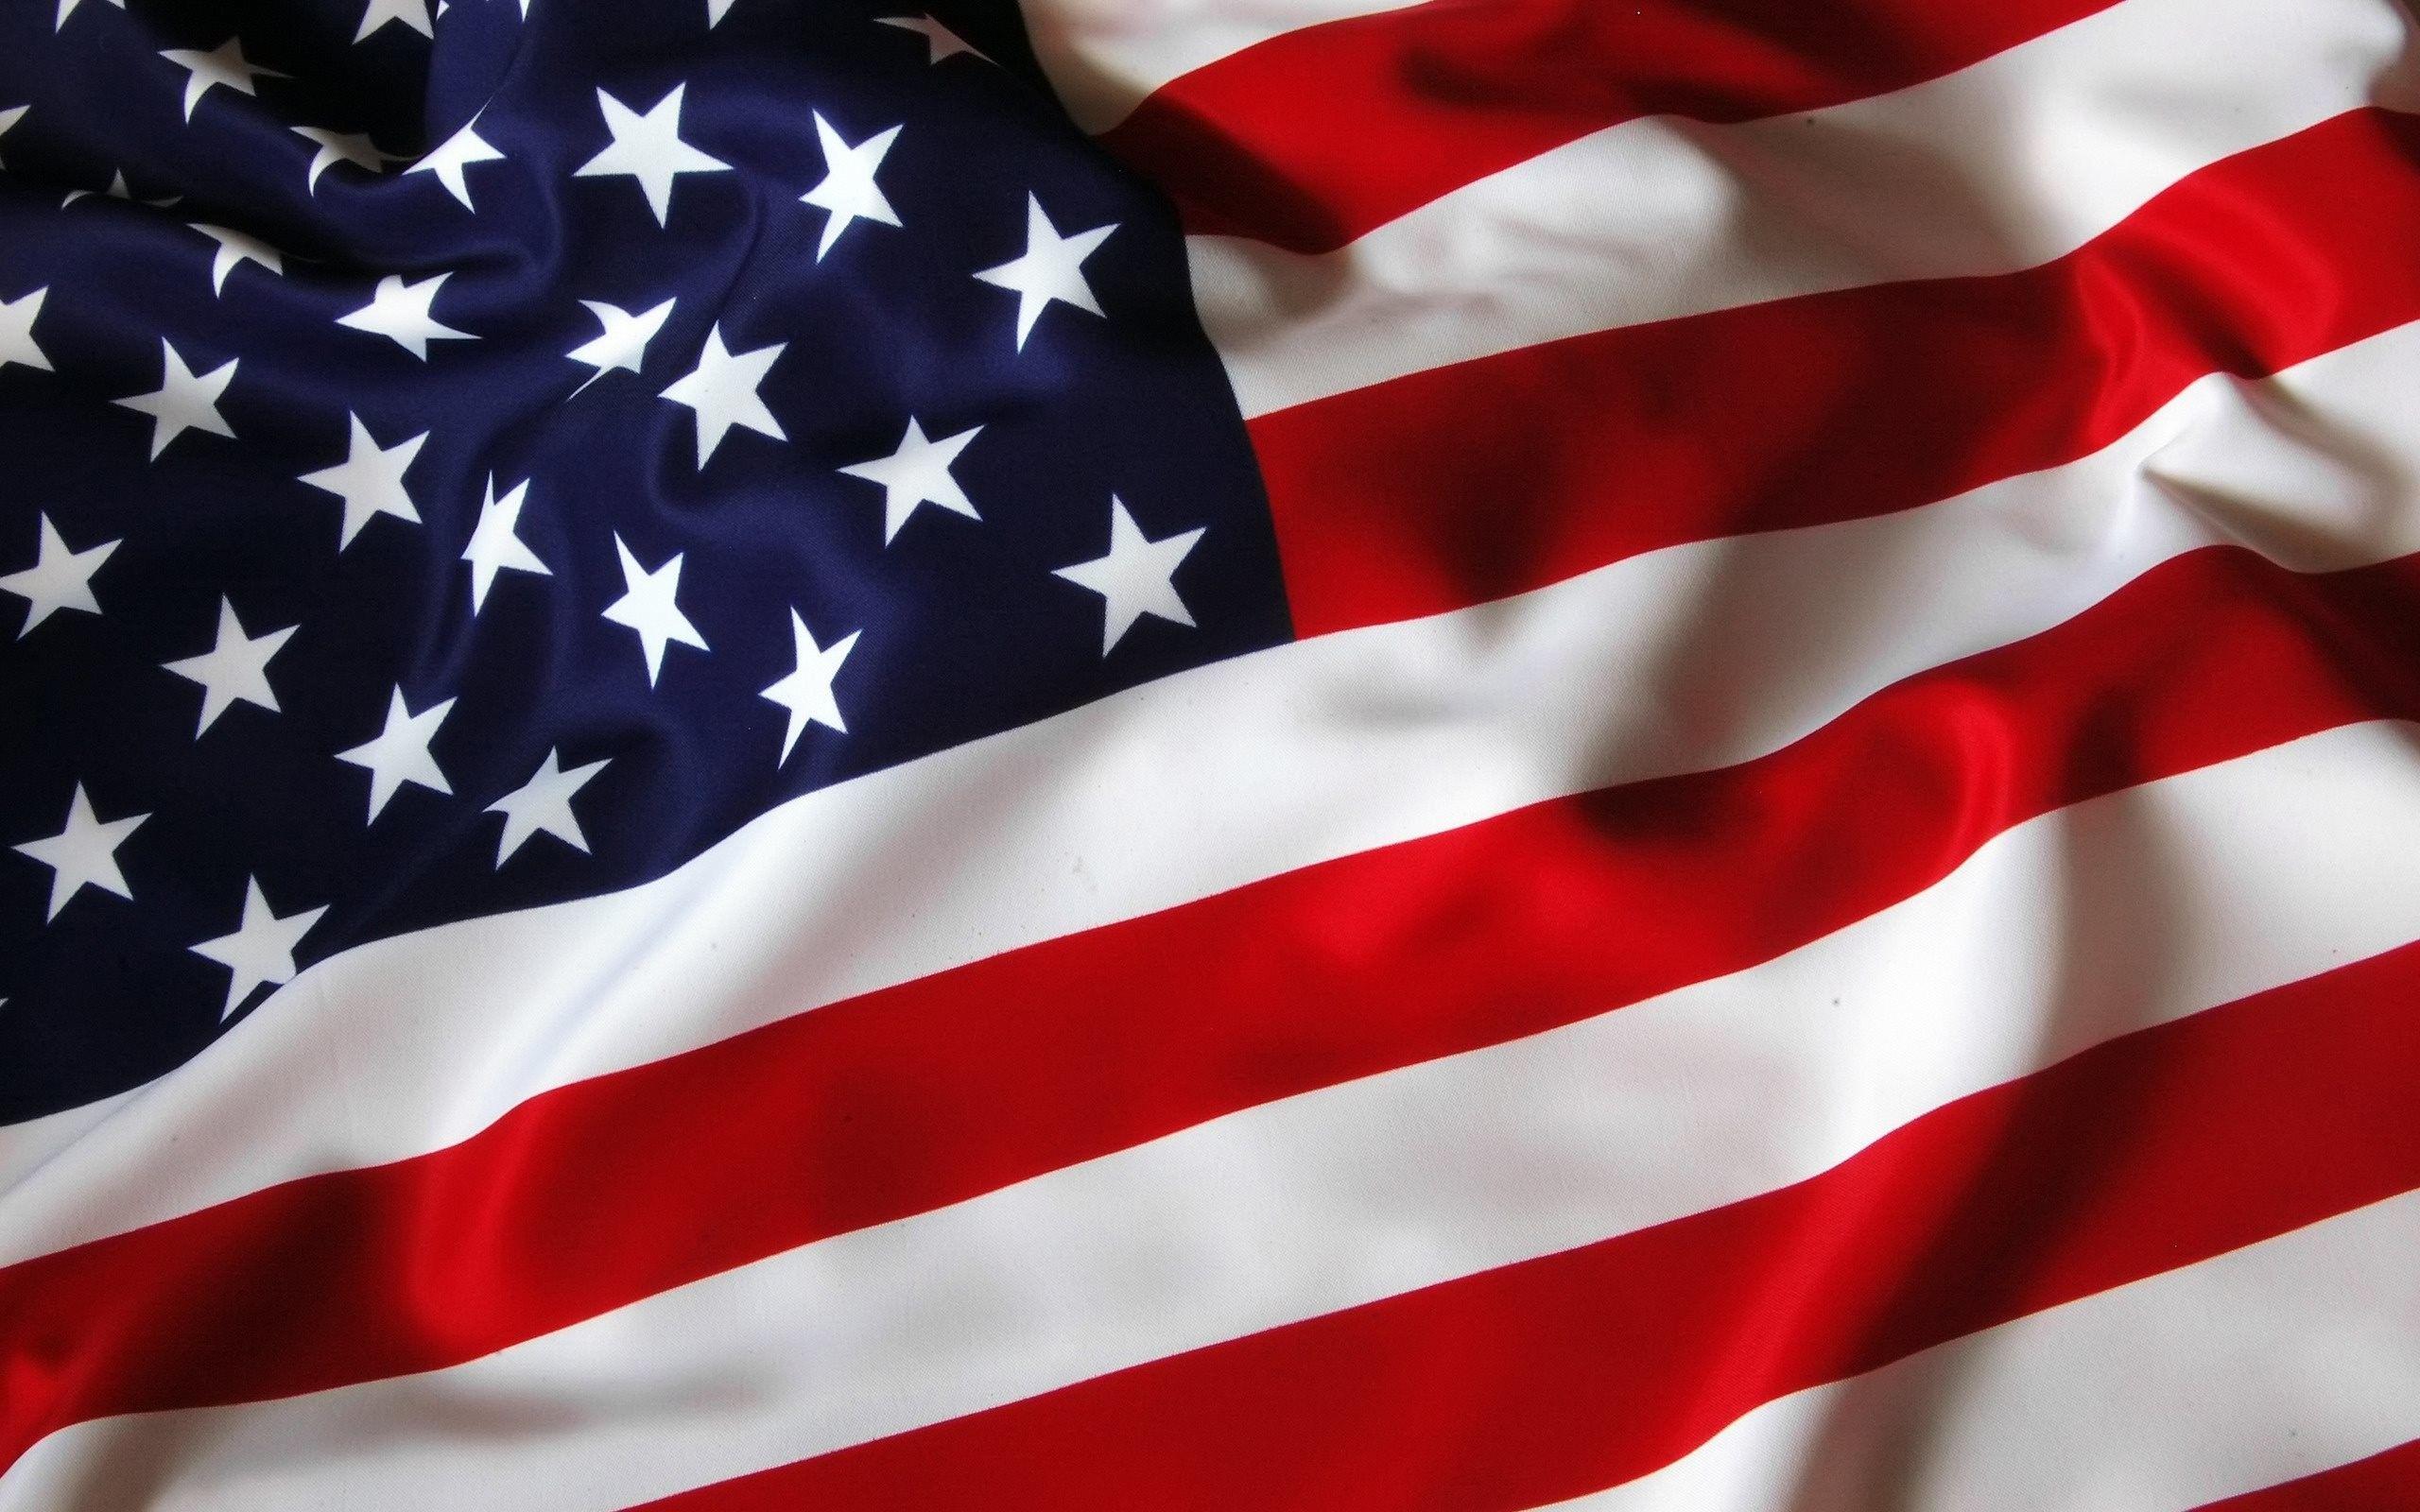 Widescreen High Resolution American Flag Wallpaper 2560x1600 For